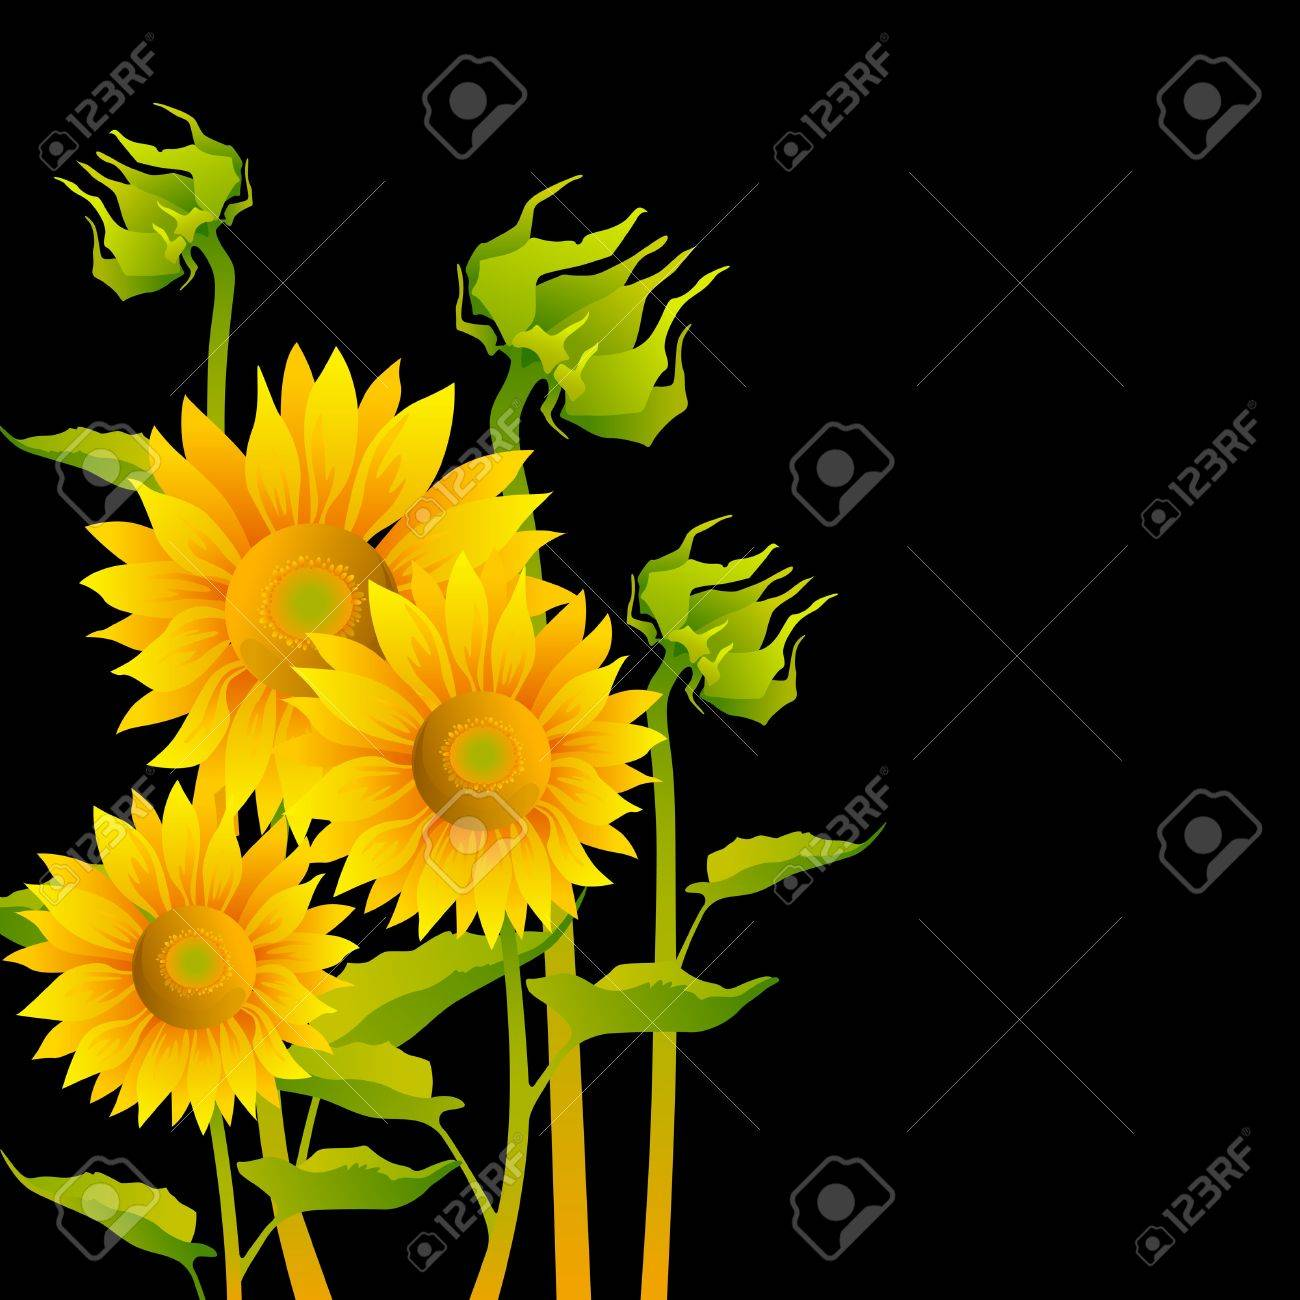 beautiful yellow Sunflowers on black background Stock Vector - 9159847